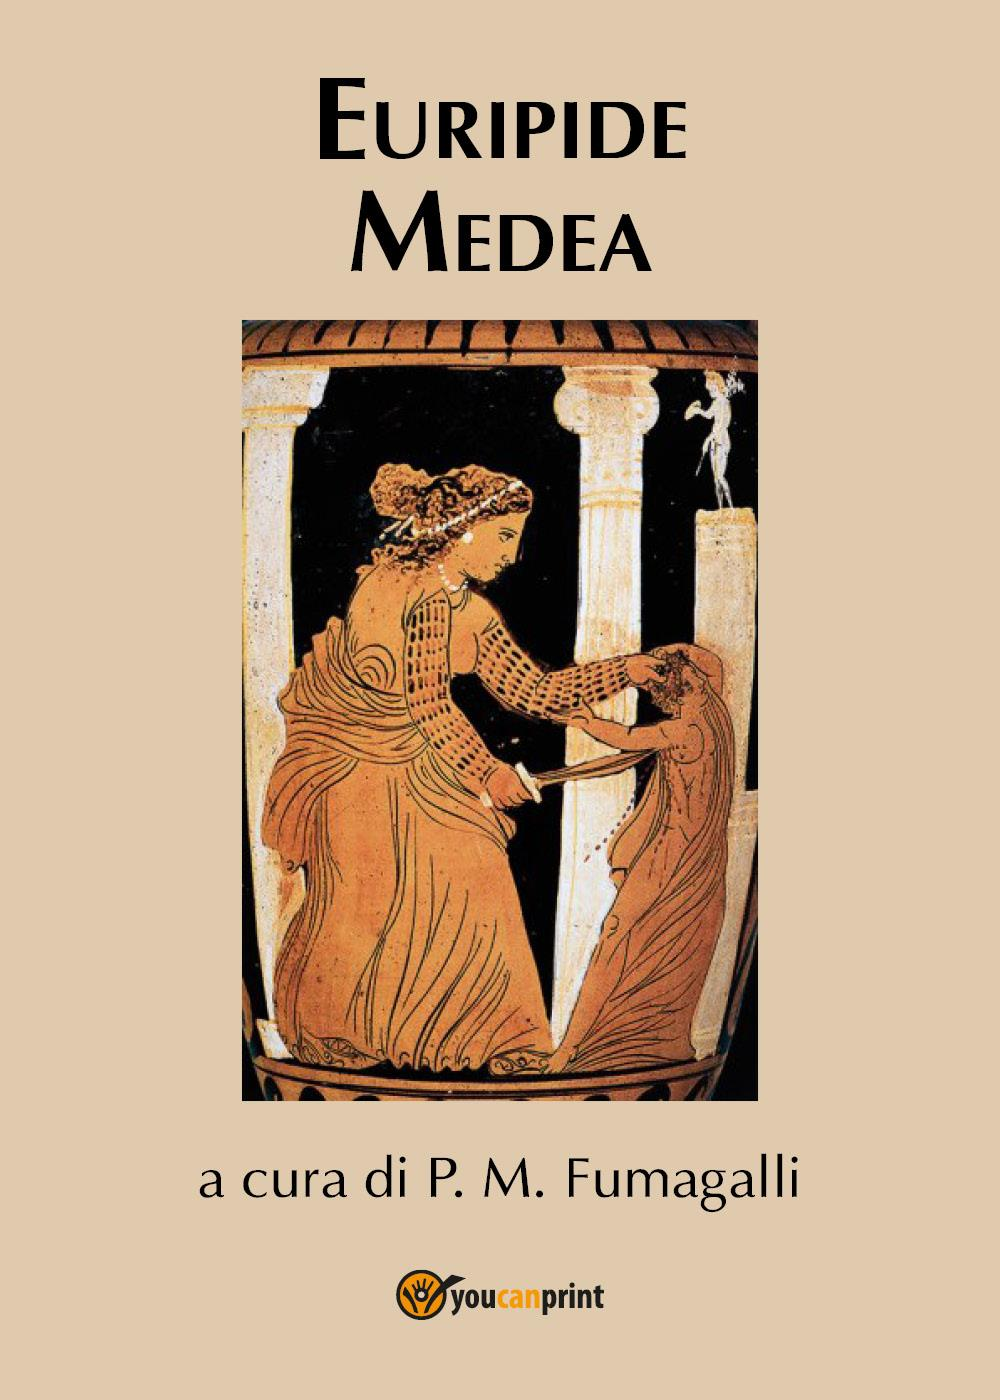 Euripide Medea